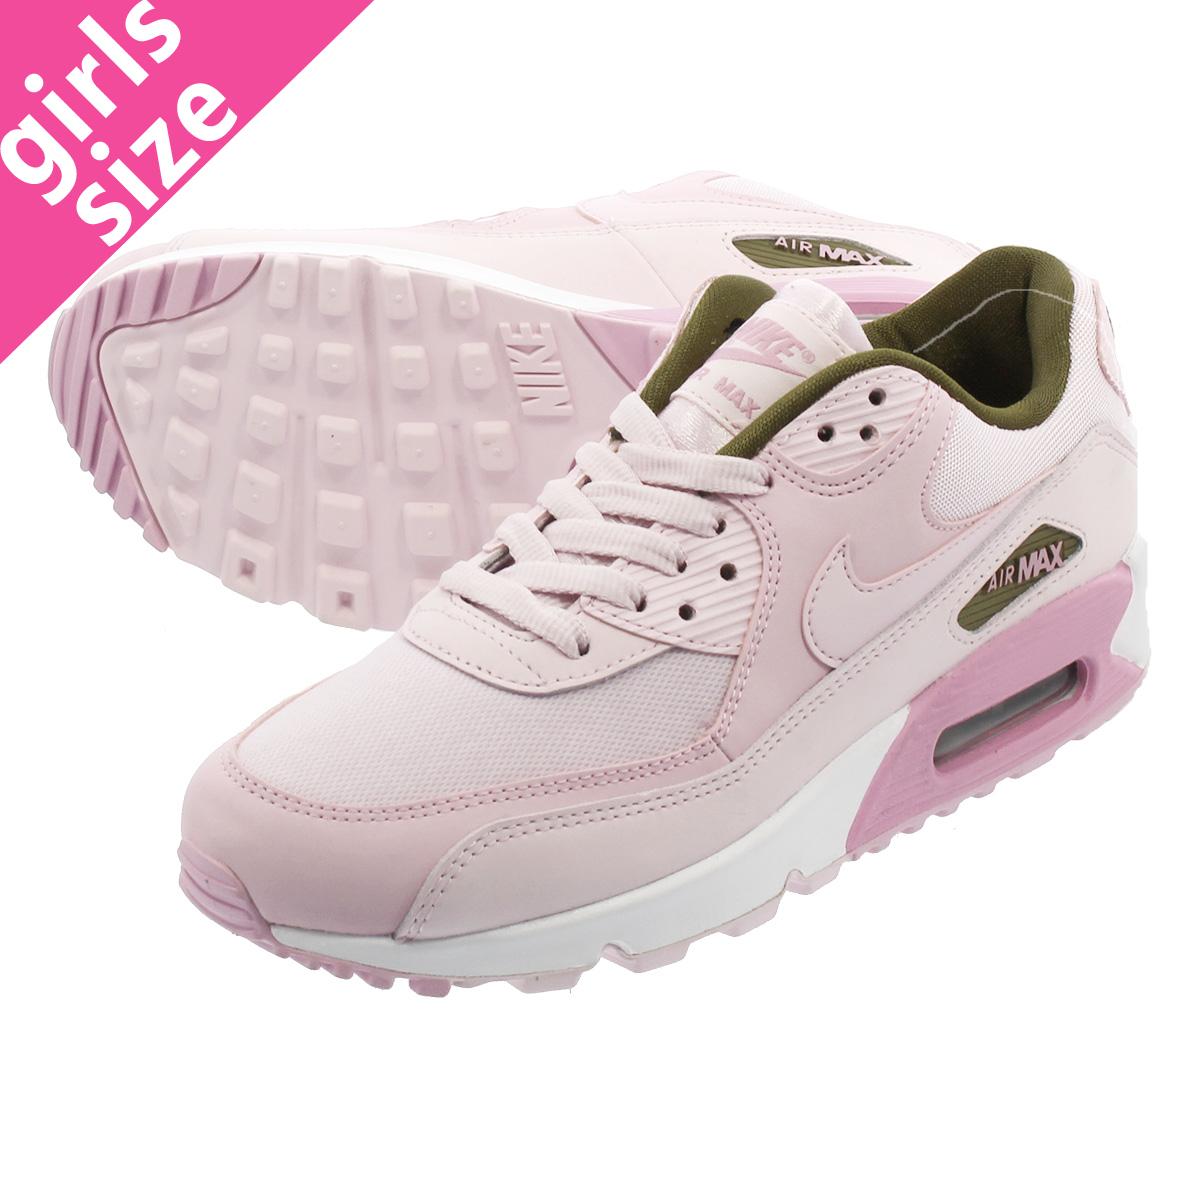 quality design c84f9 fe57a NIKE WMNS AIR MAX 90 SE Nike women Air Max 90 SE PINK/WHITE 881,105-605